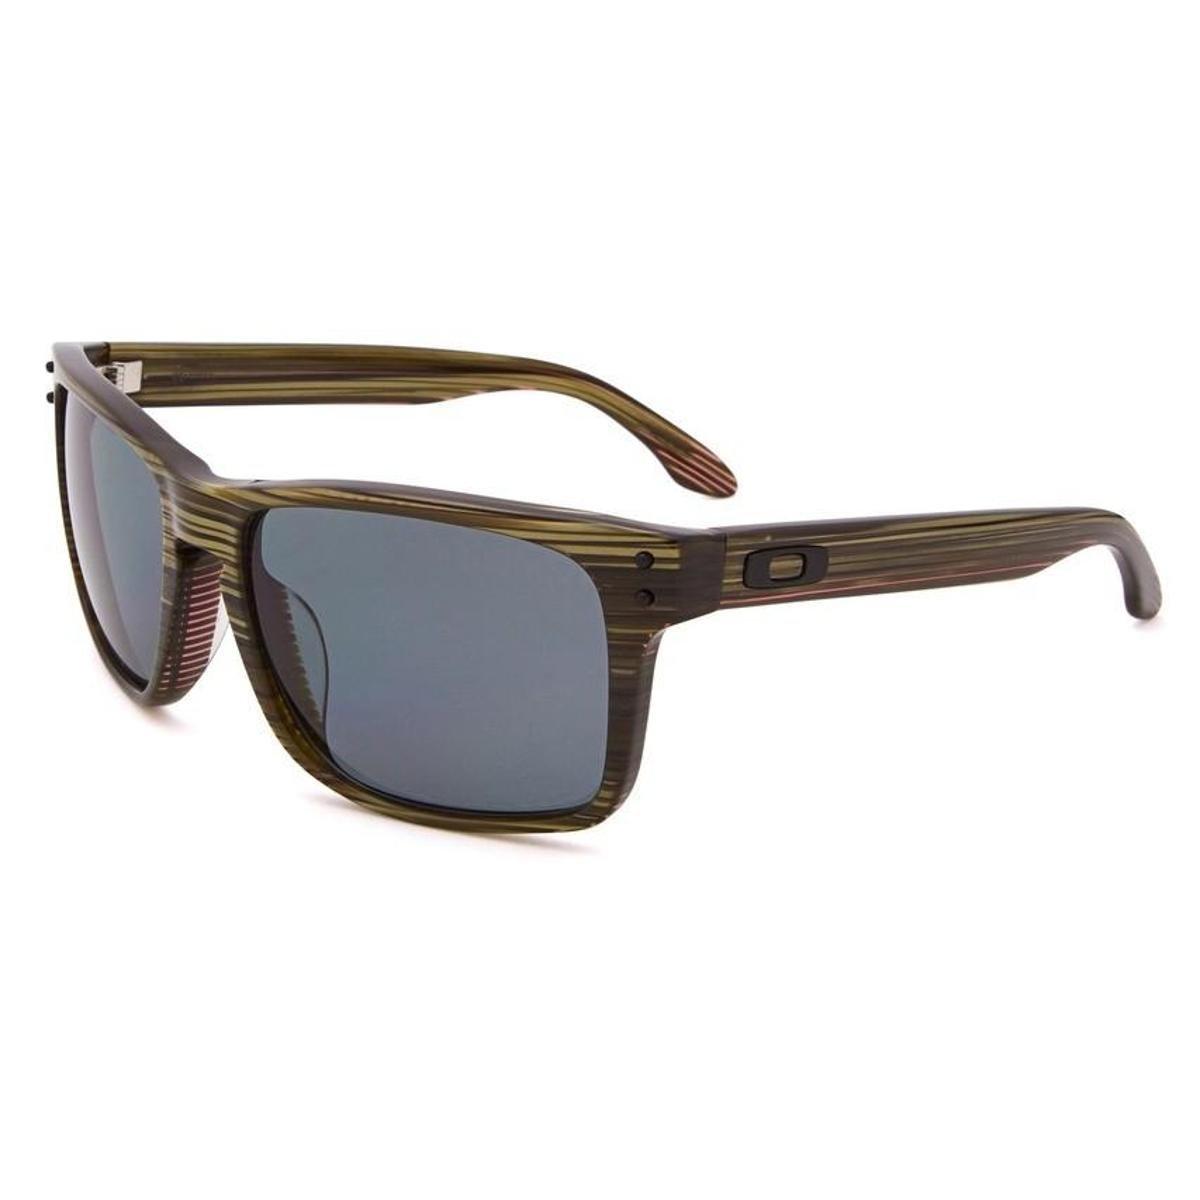 Óculos Oakley Holbrook Lx Banded Green Grey Polarizado - Compre ... 6ccf2570b0